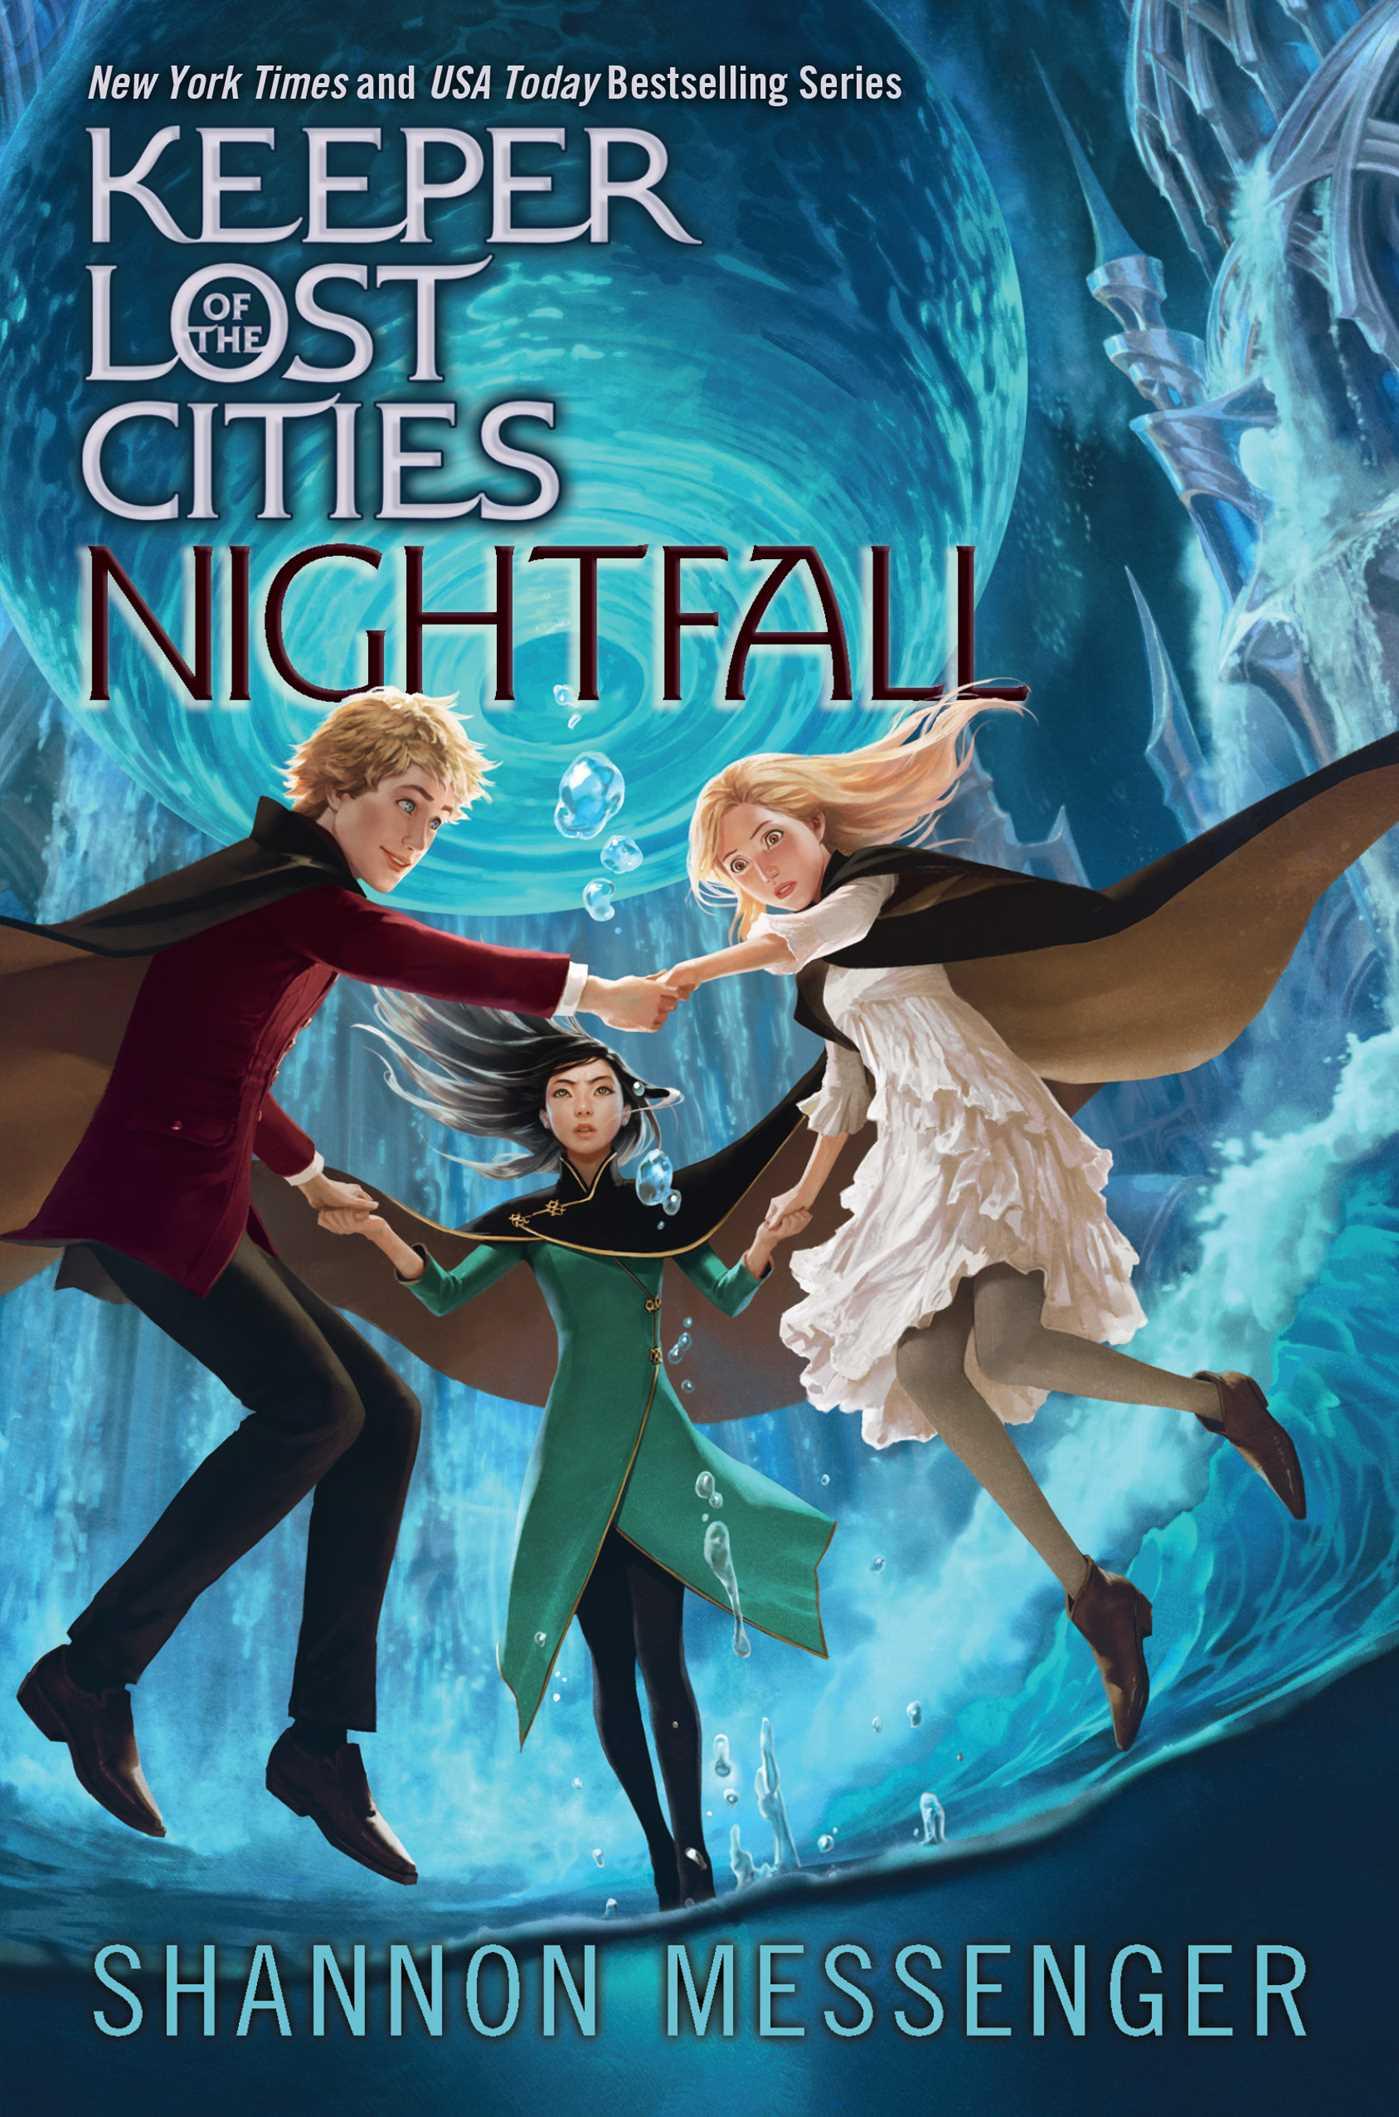 Nightfall 9781481497404 hr